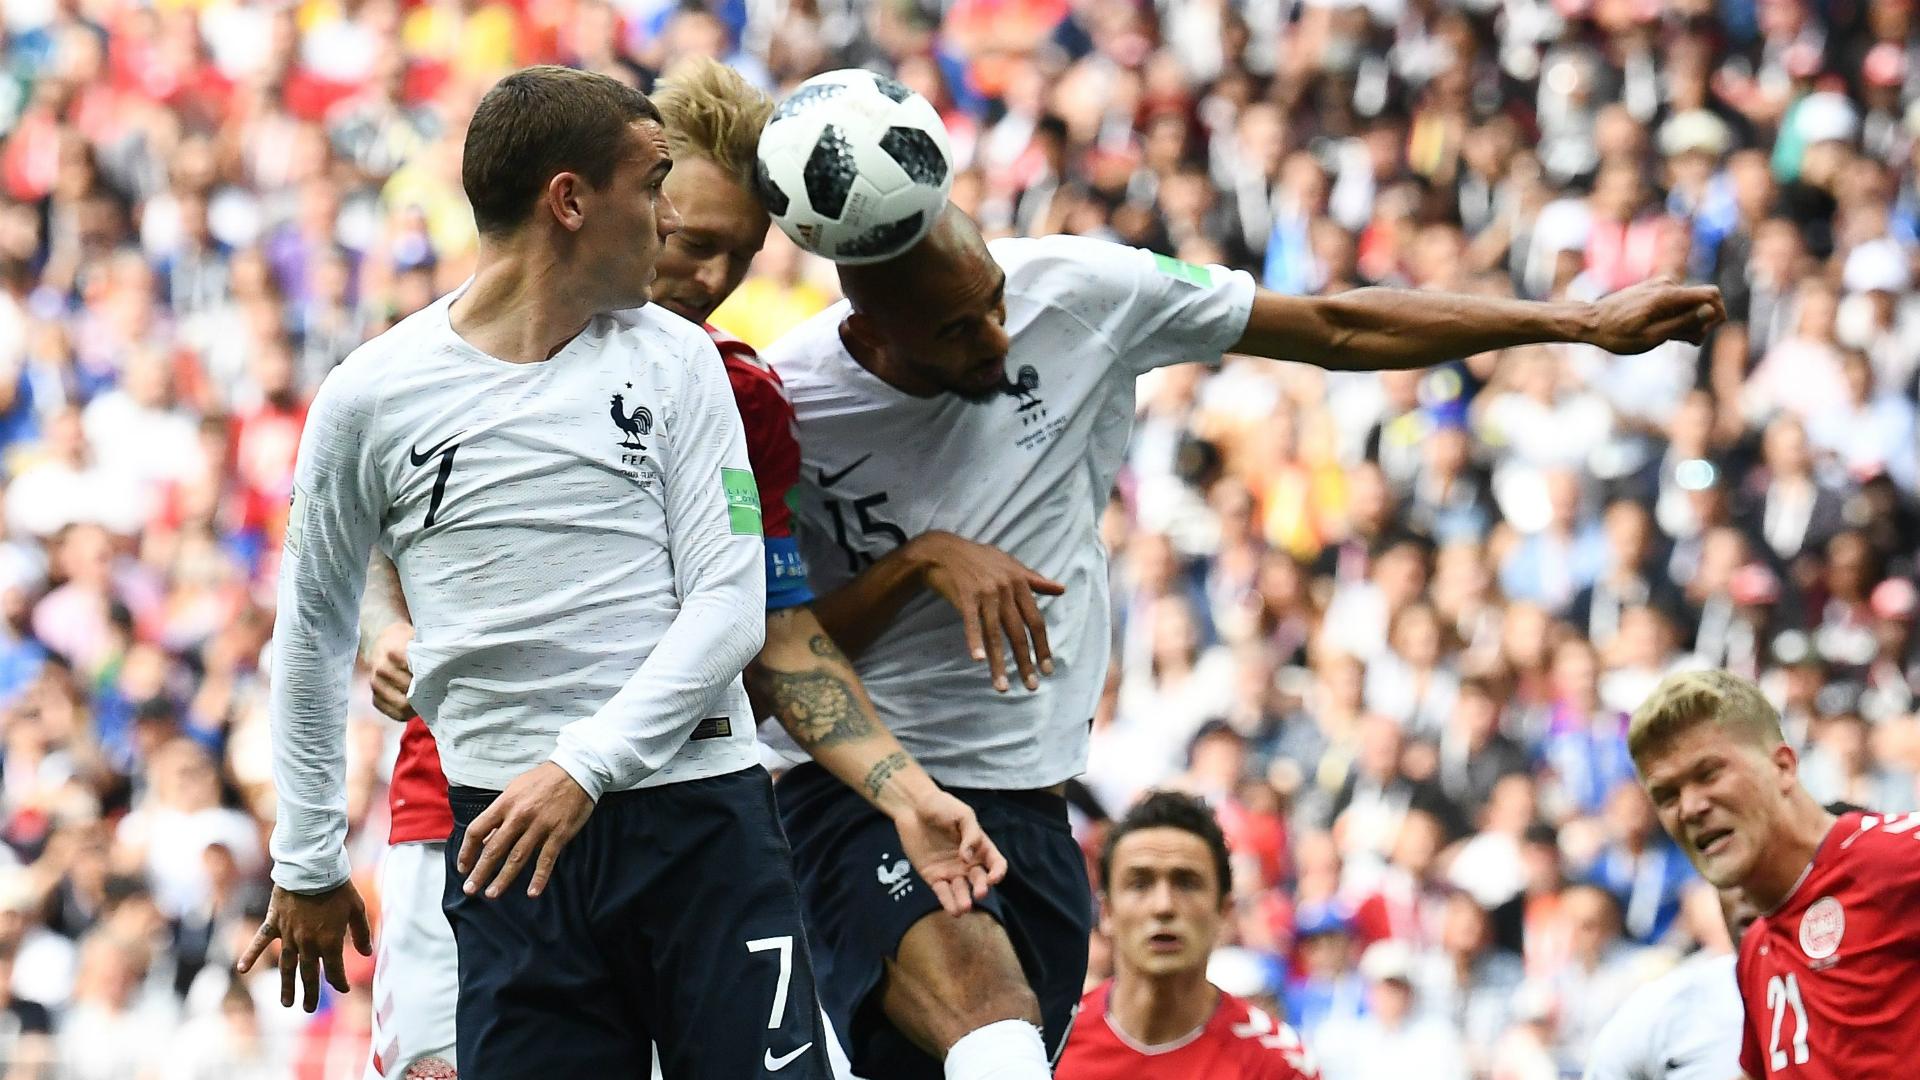 Antoine Griezmann Denmark France World Cup 26062018.jpg